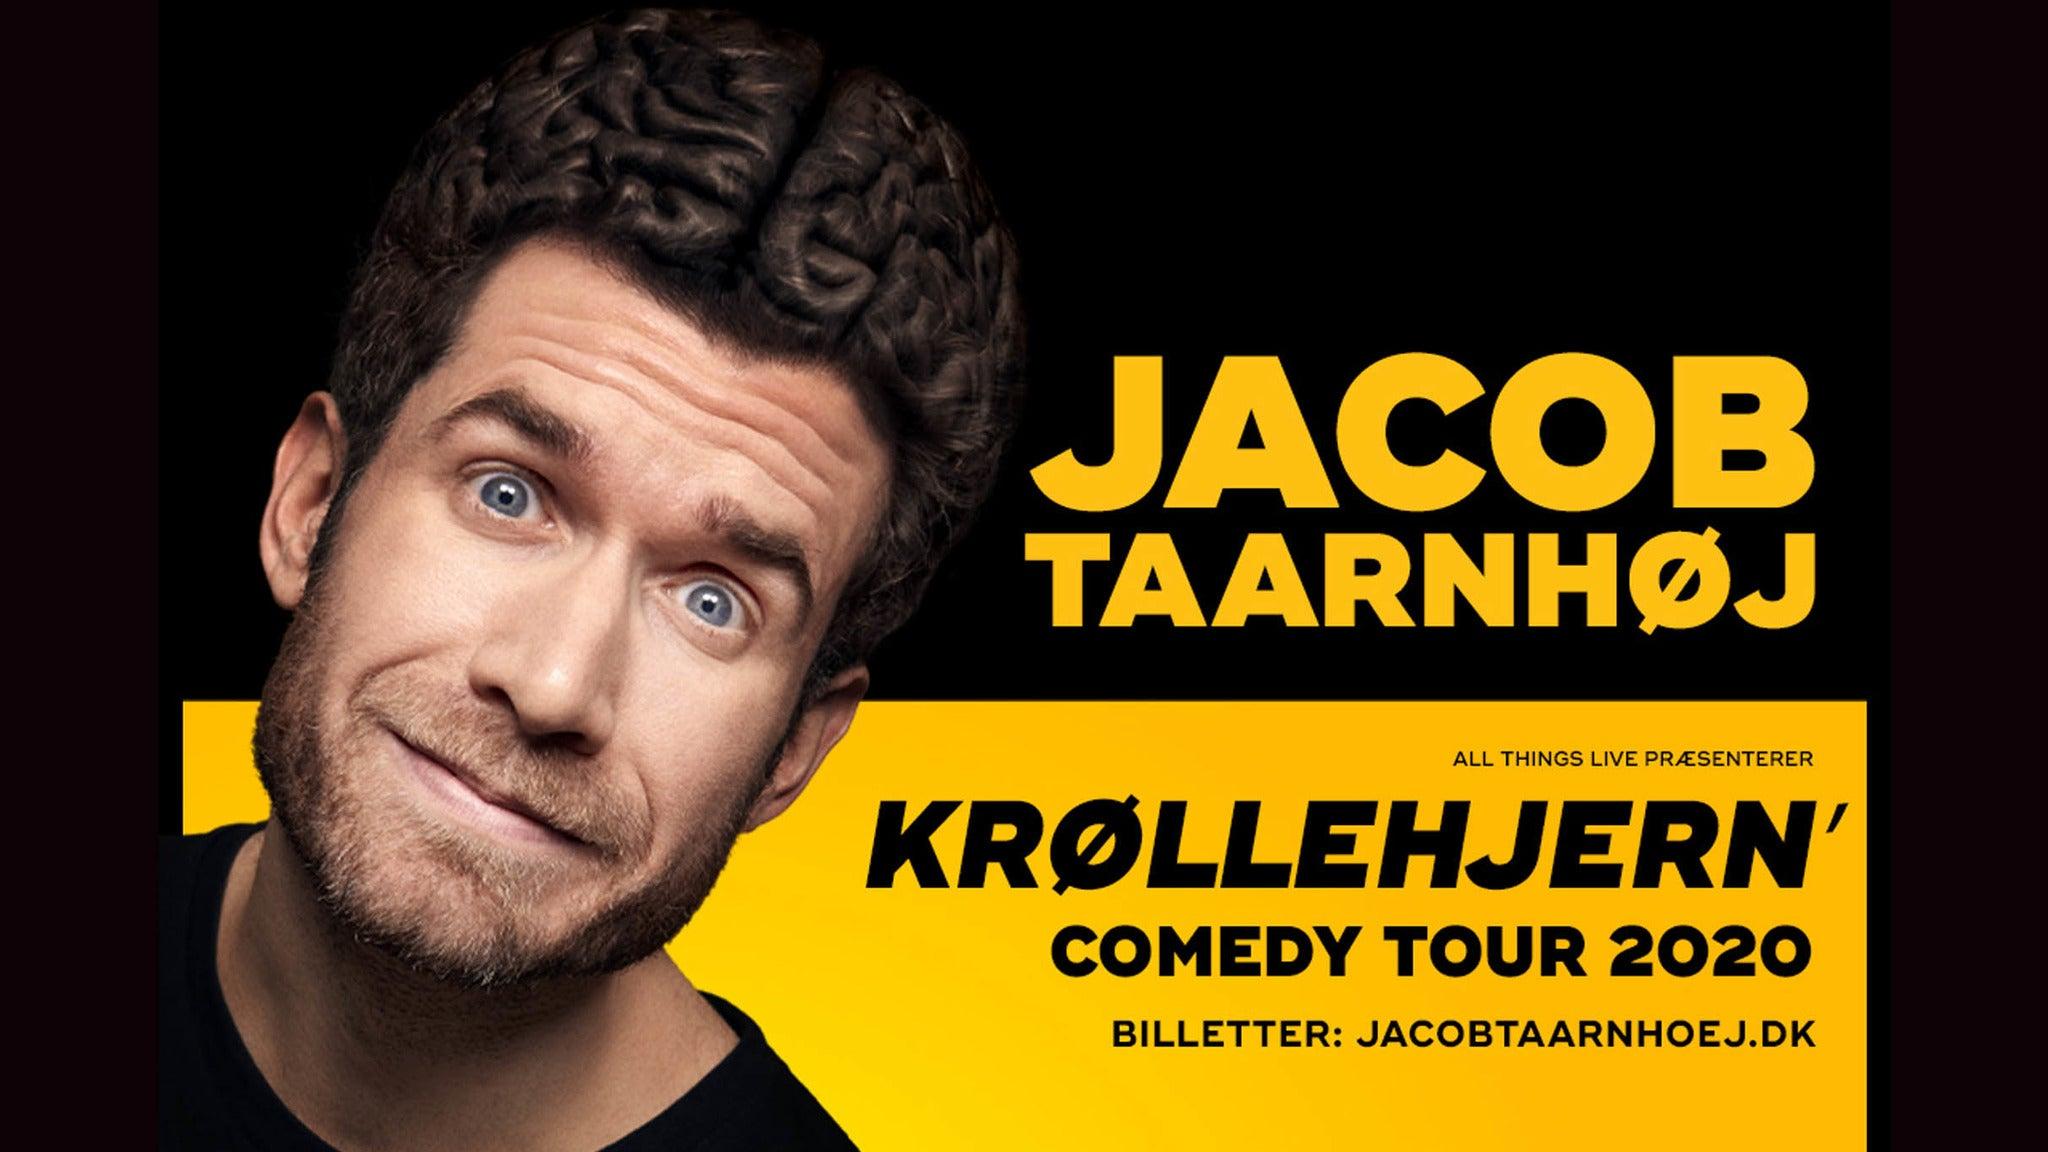 JACOB TAARNHØJ – KRØLLEHJERN'